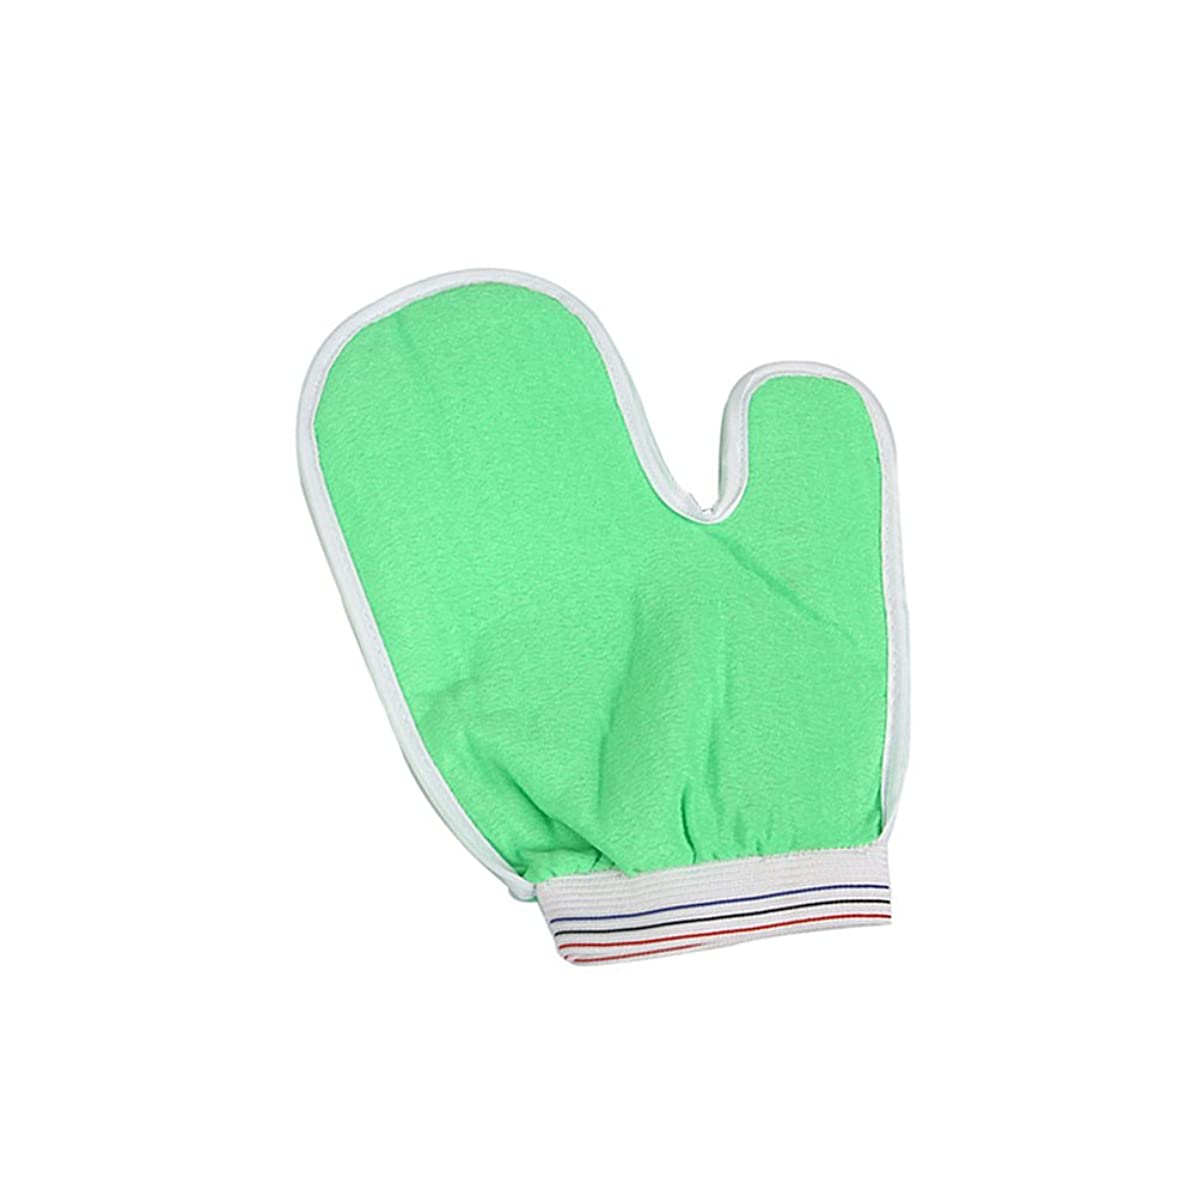 Heallily Bathシャワースポンジグローブボディ剥離ミットシャワーボディクリーニングスクラバー(ランダムカラー)